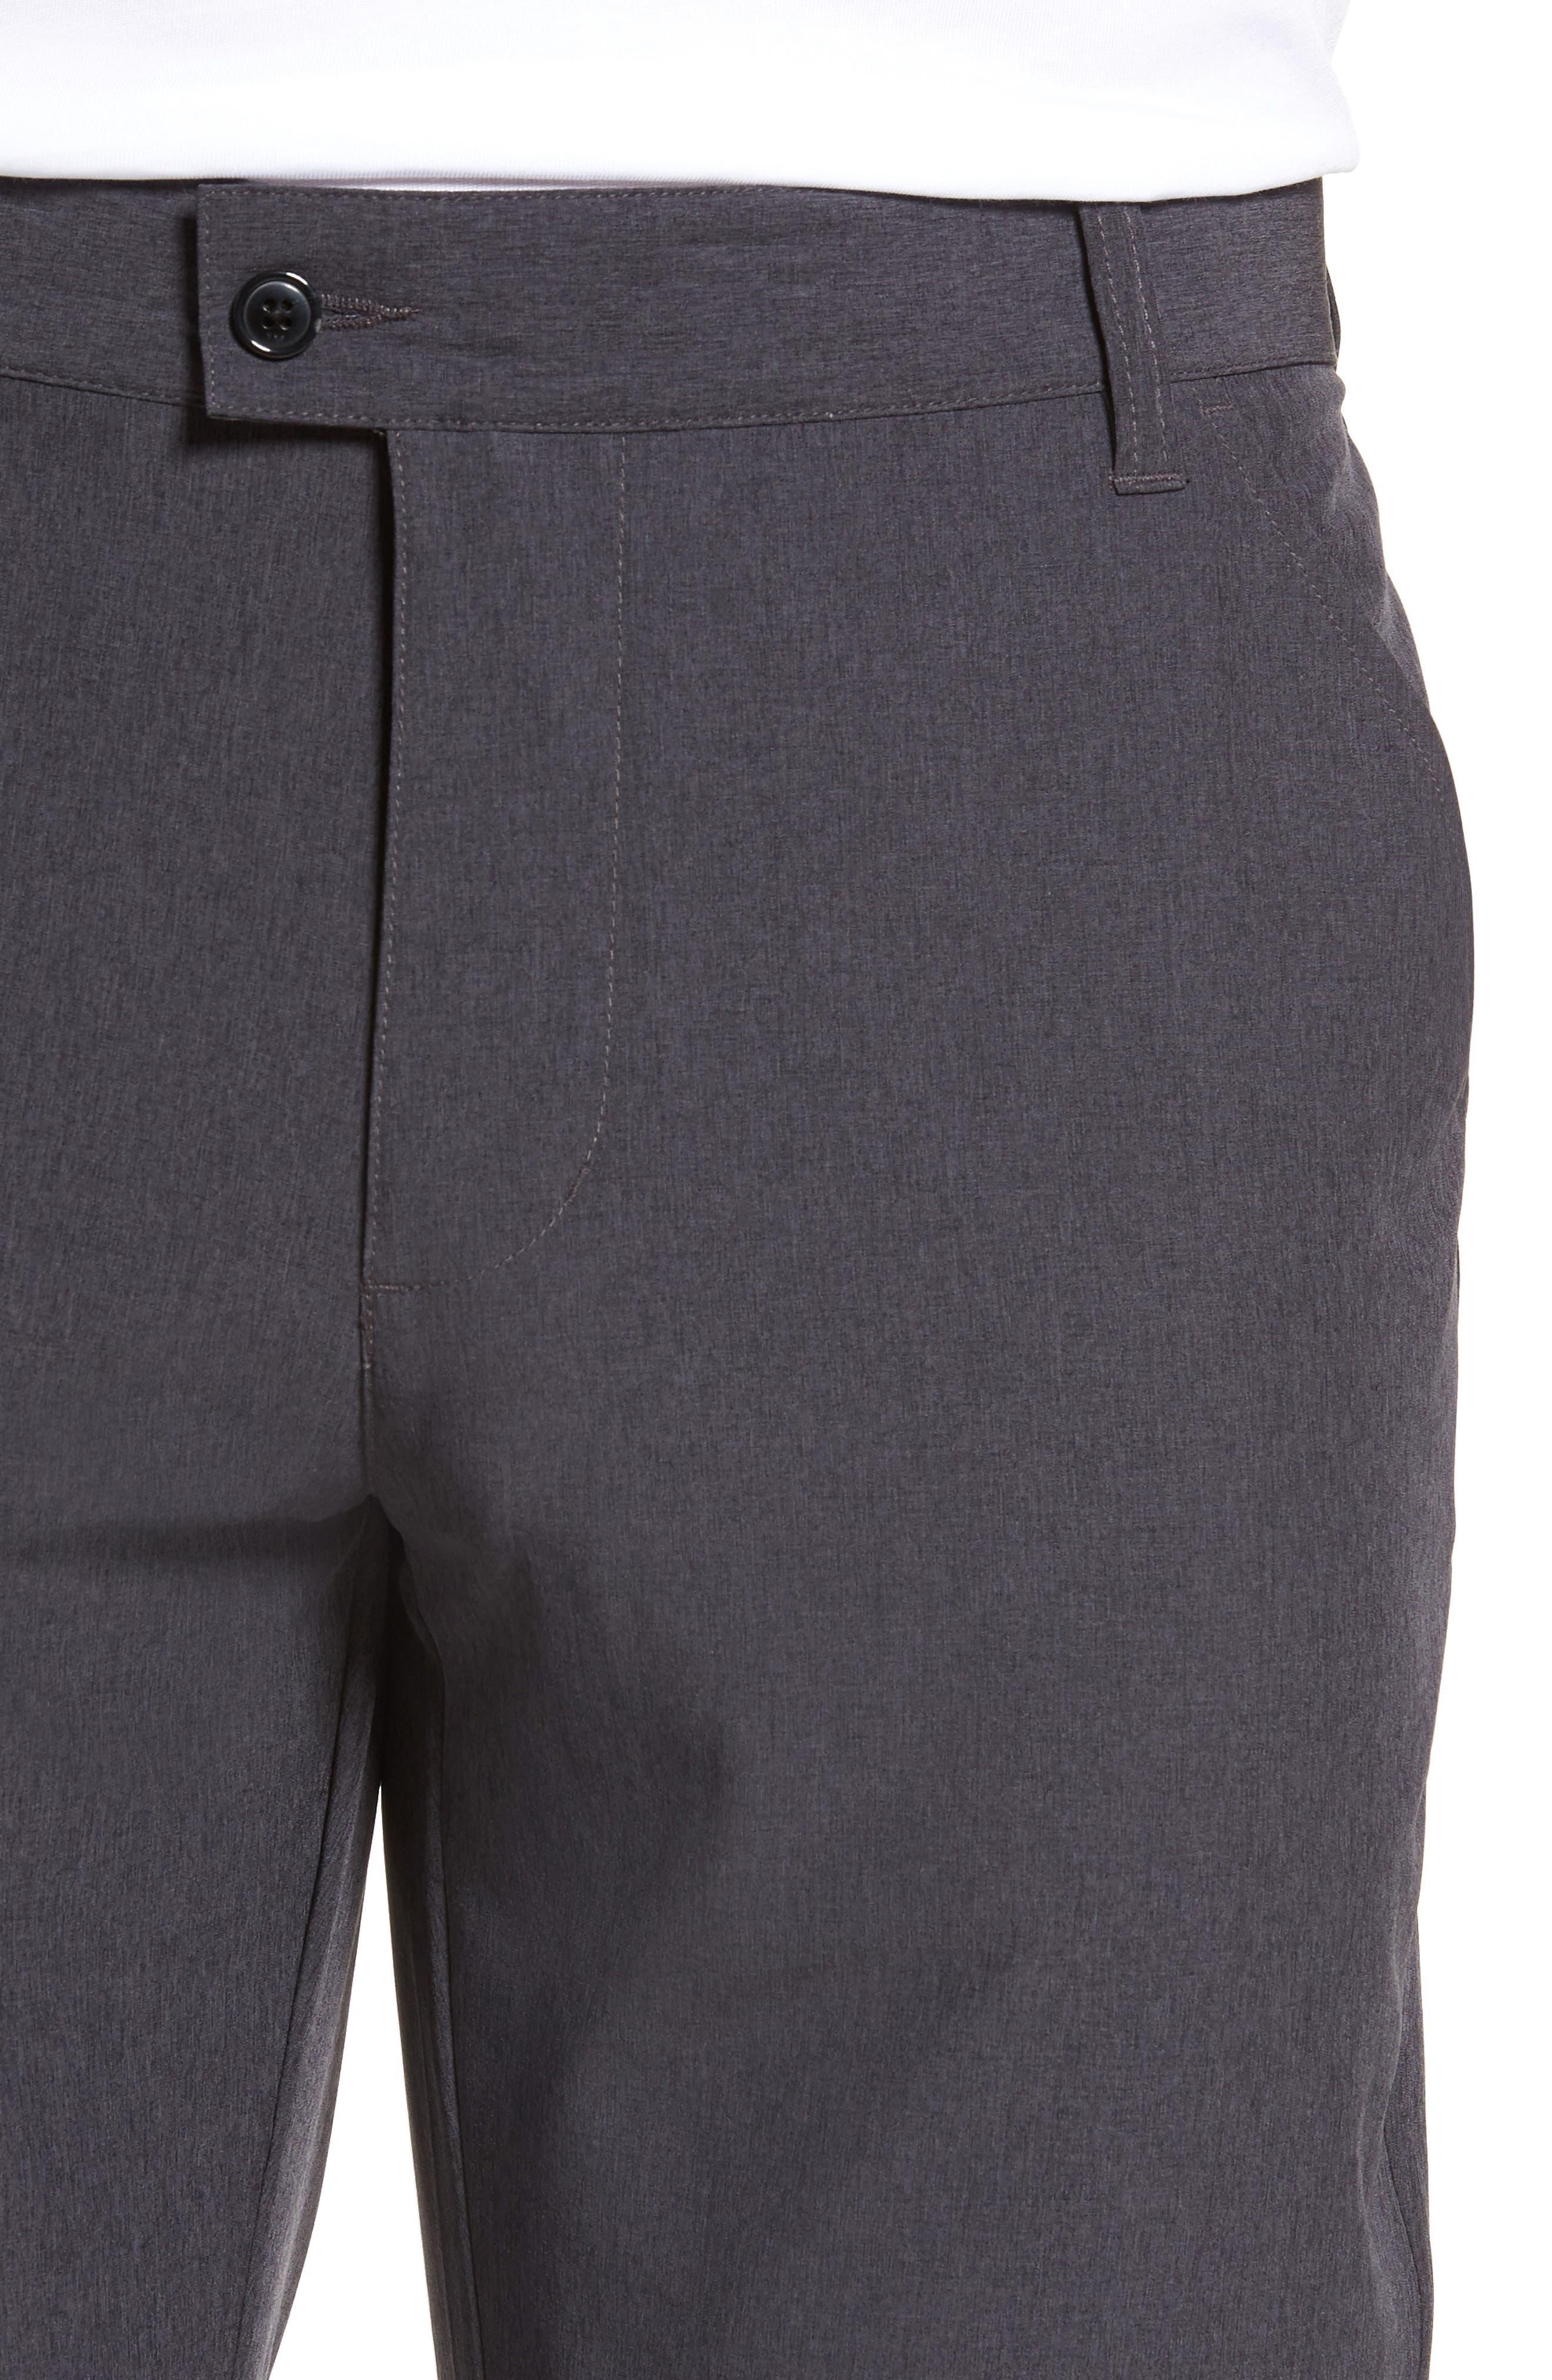 Pantladdium Pants,                             Alternate thumbnail 4, color,                             HEATHER BLACK